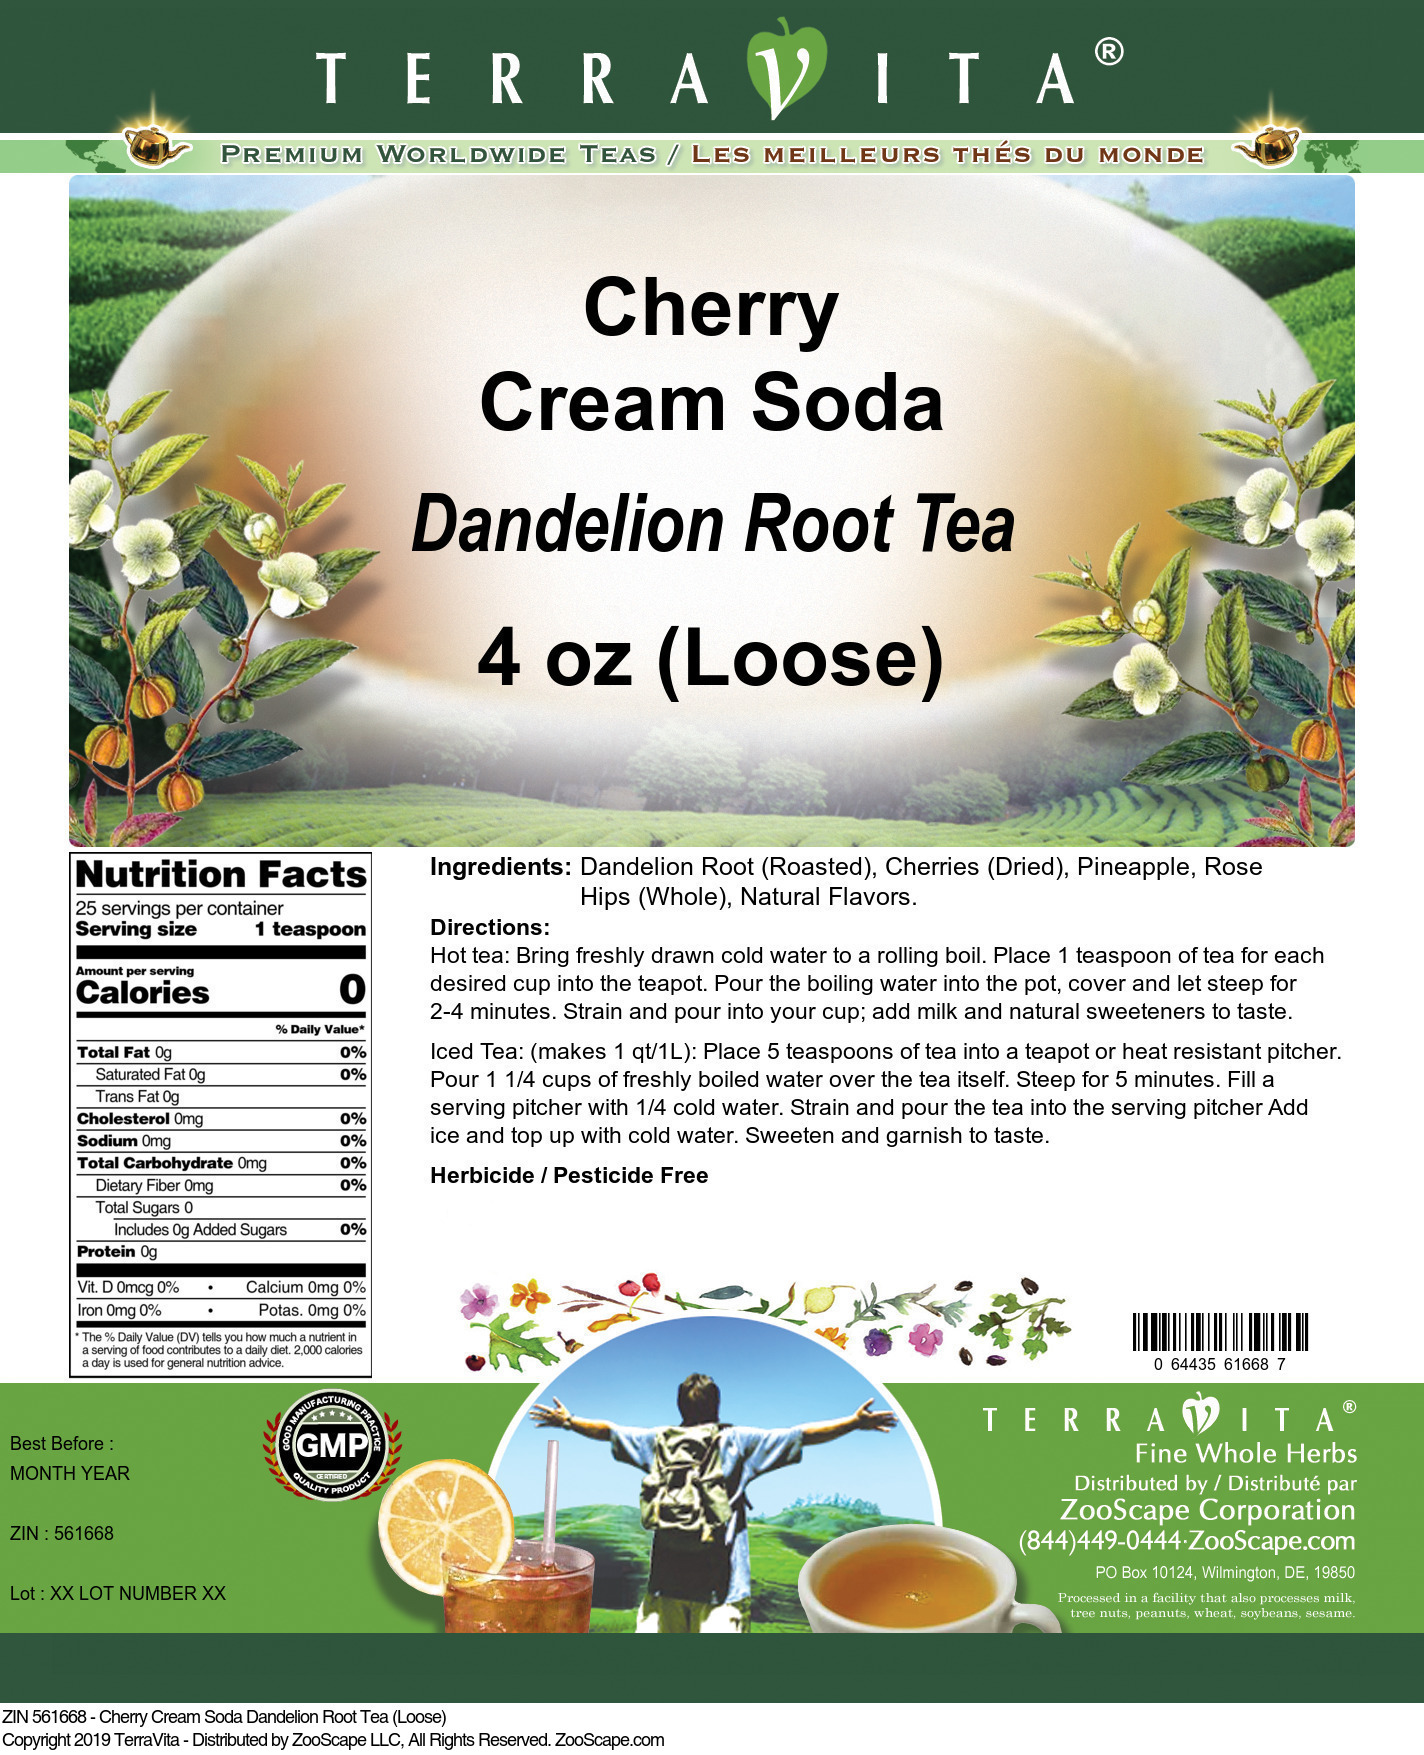 Cherry Cream Soda Dandelion Root Tea (Loose)